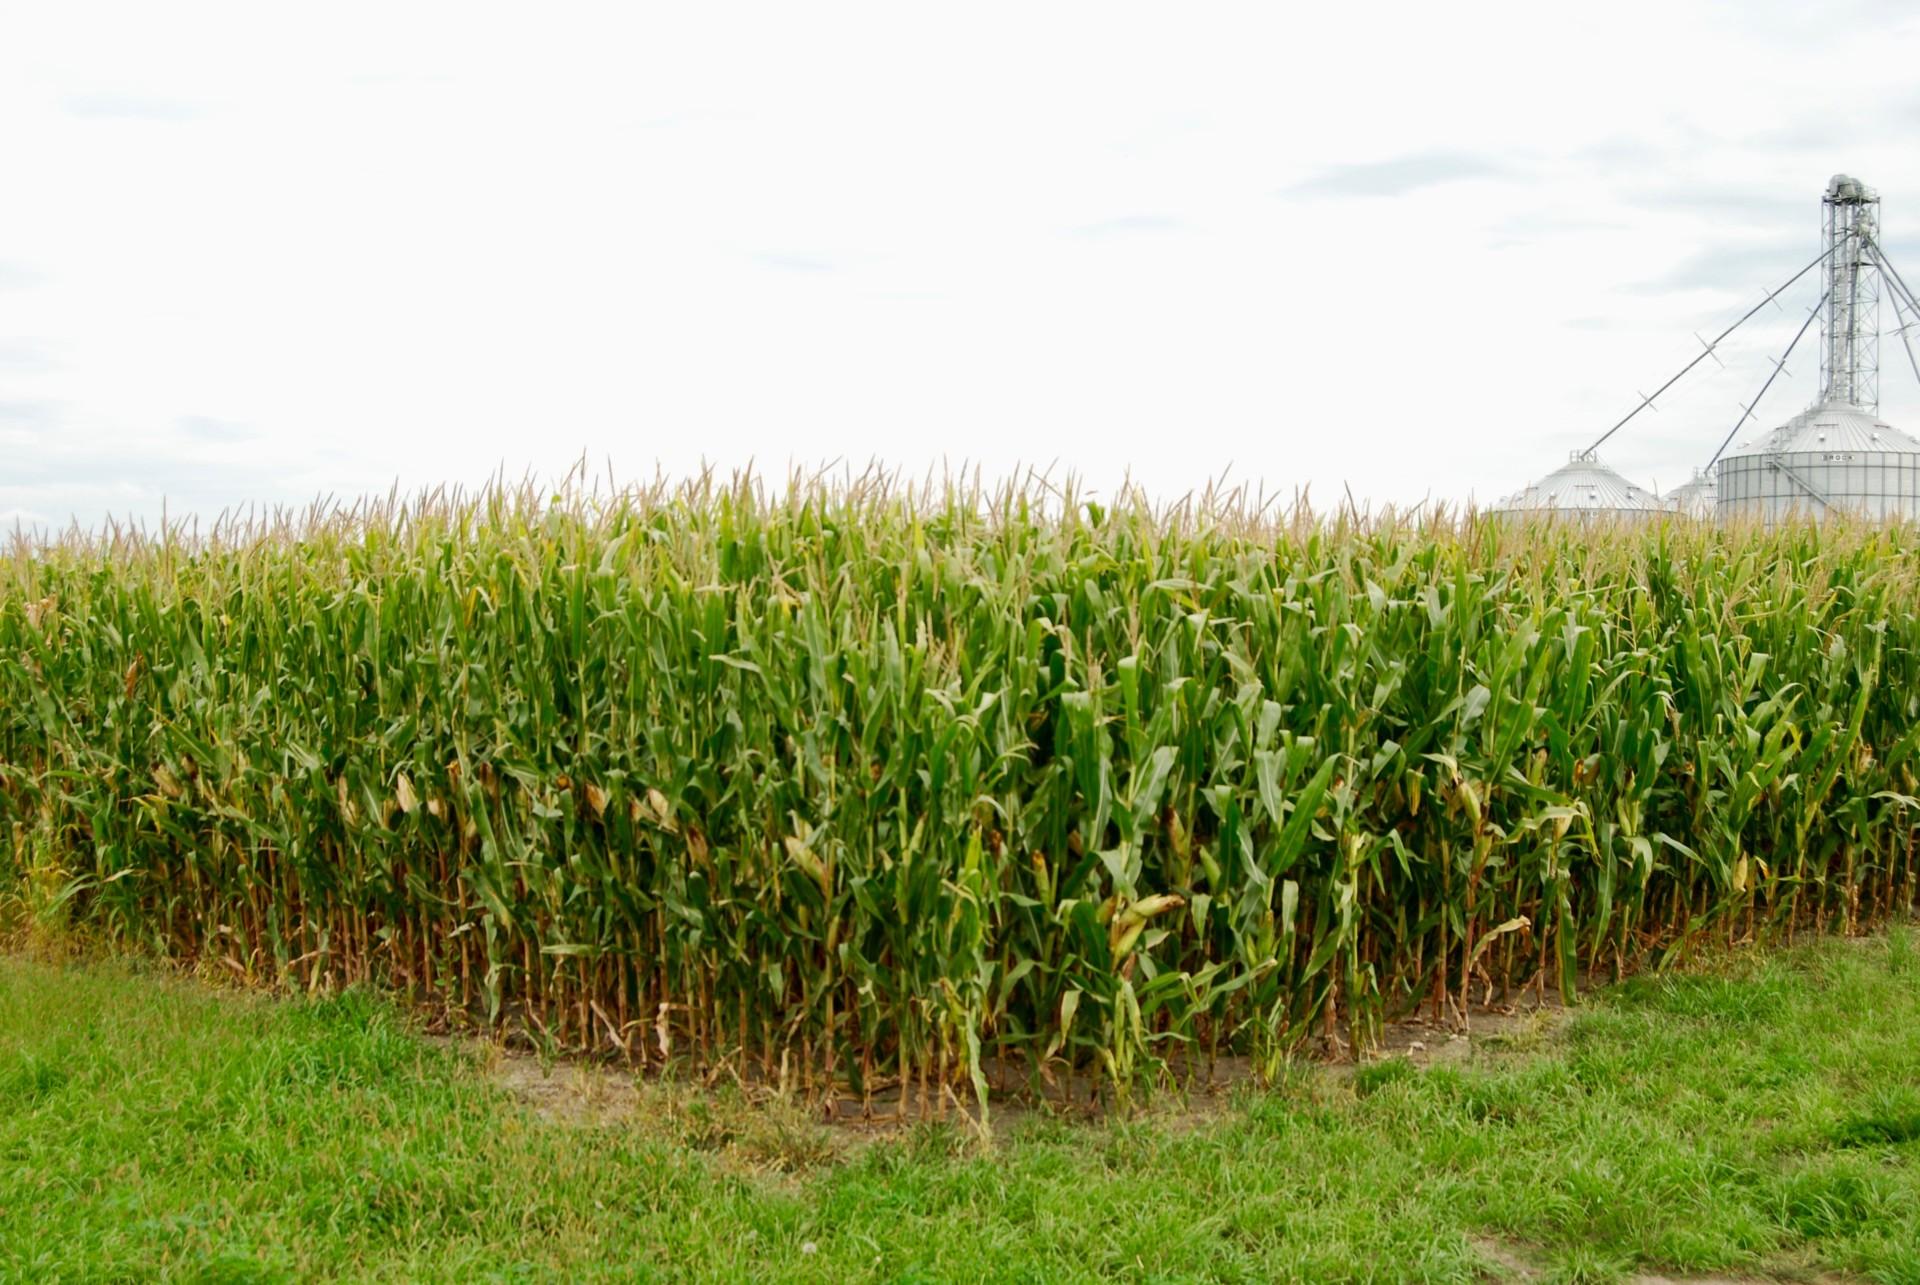 Corn field near harvest time